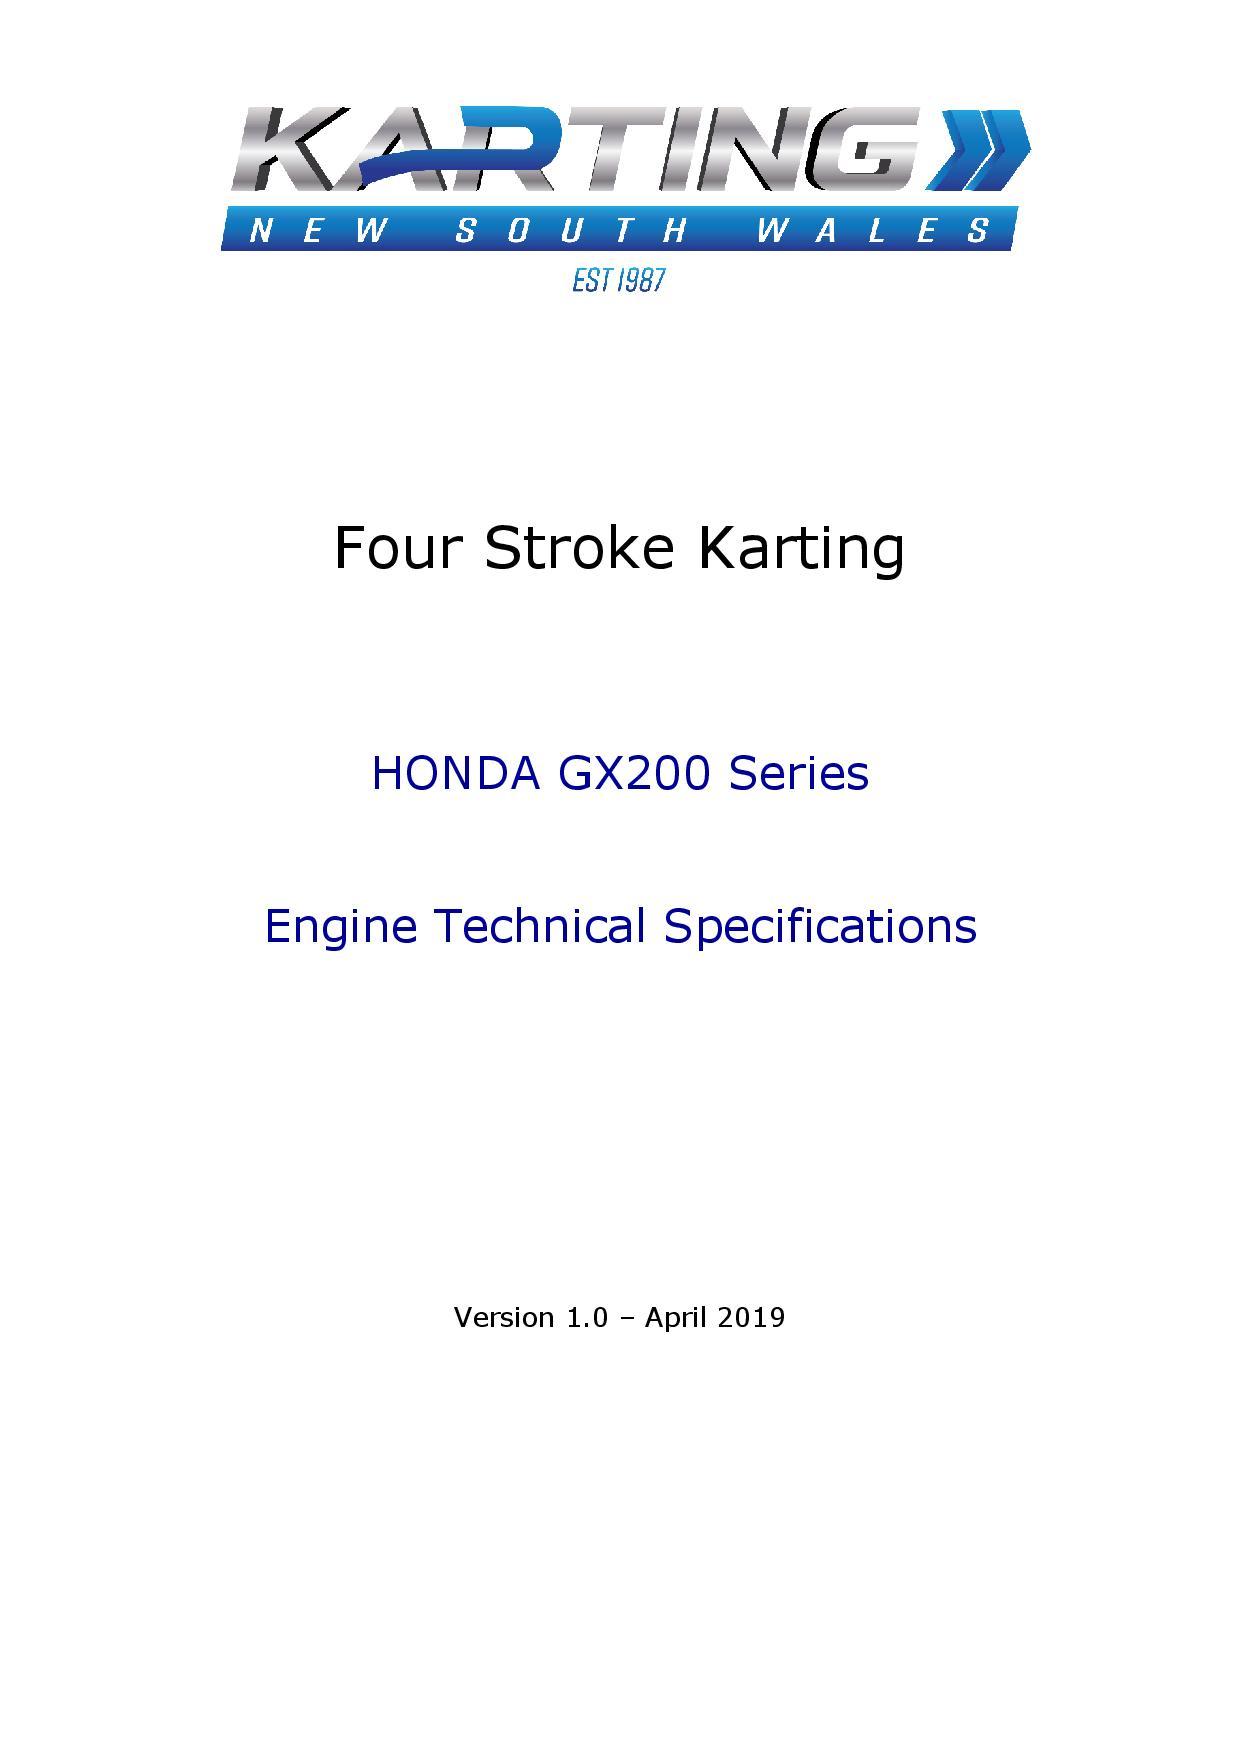 E43_Honda GX200